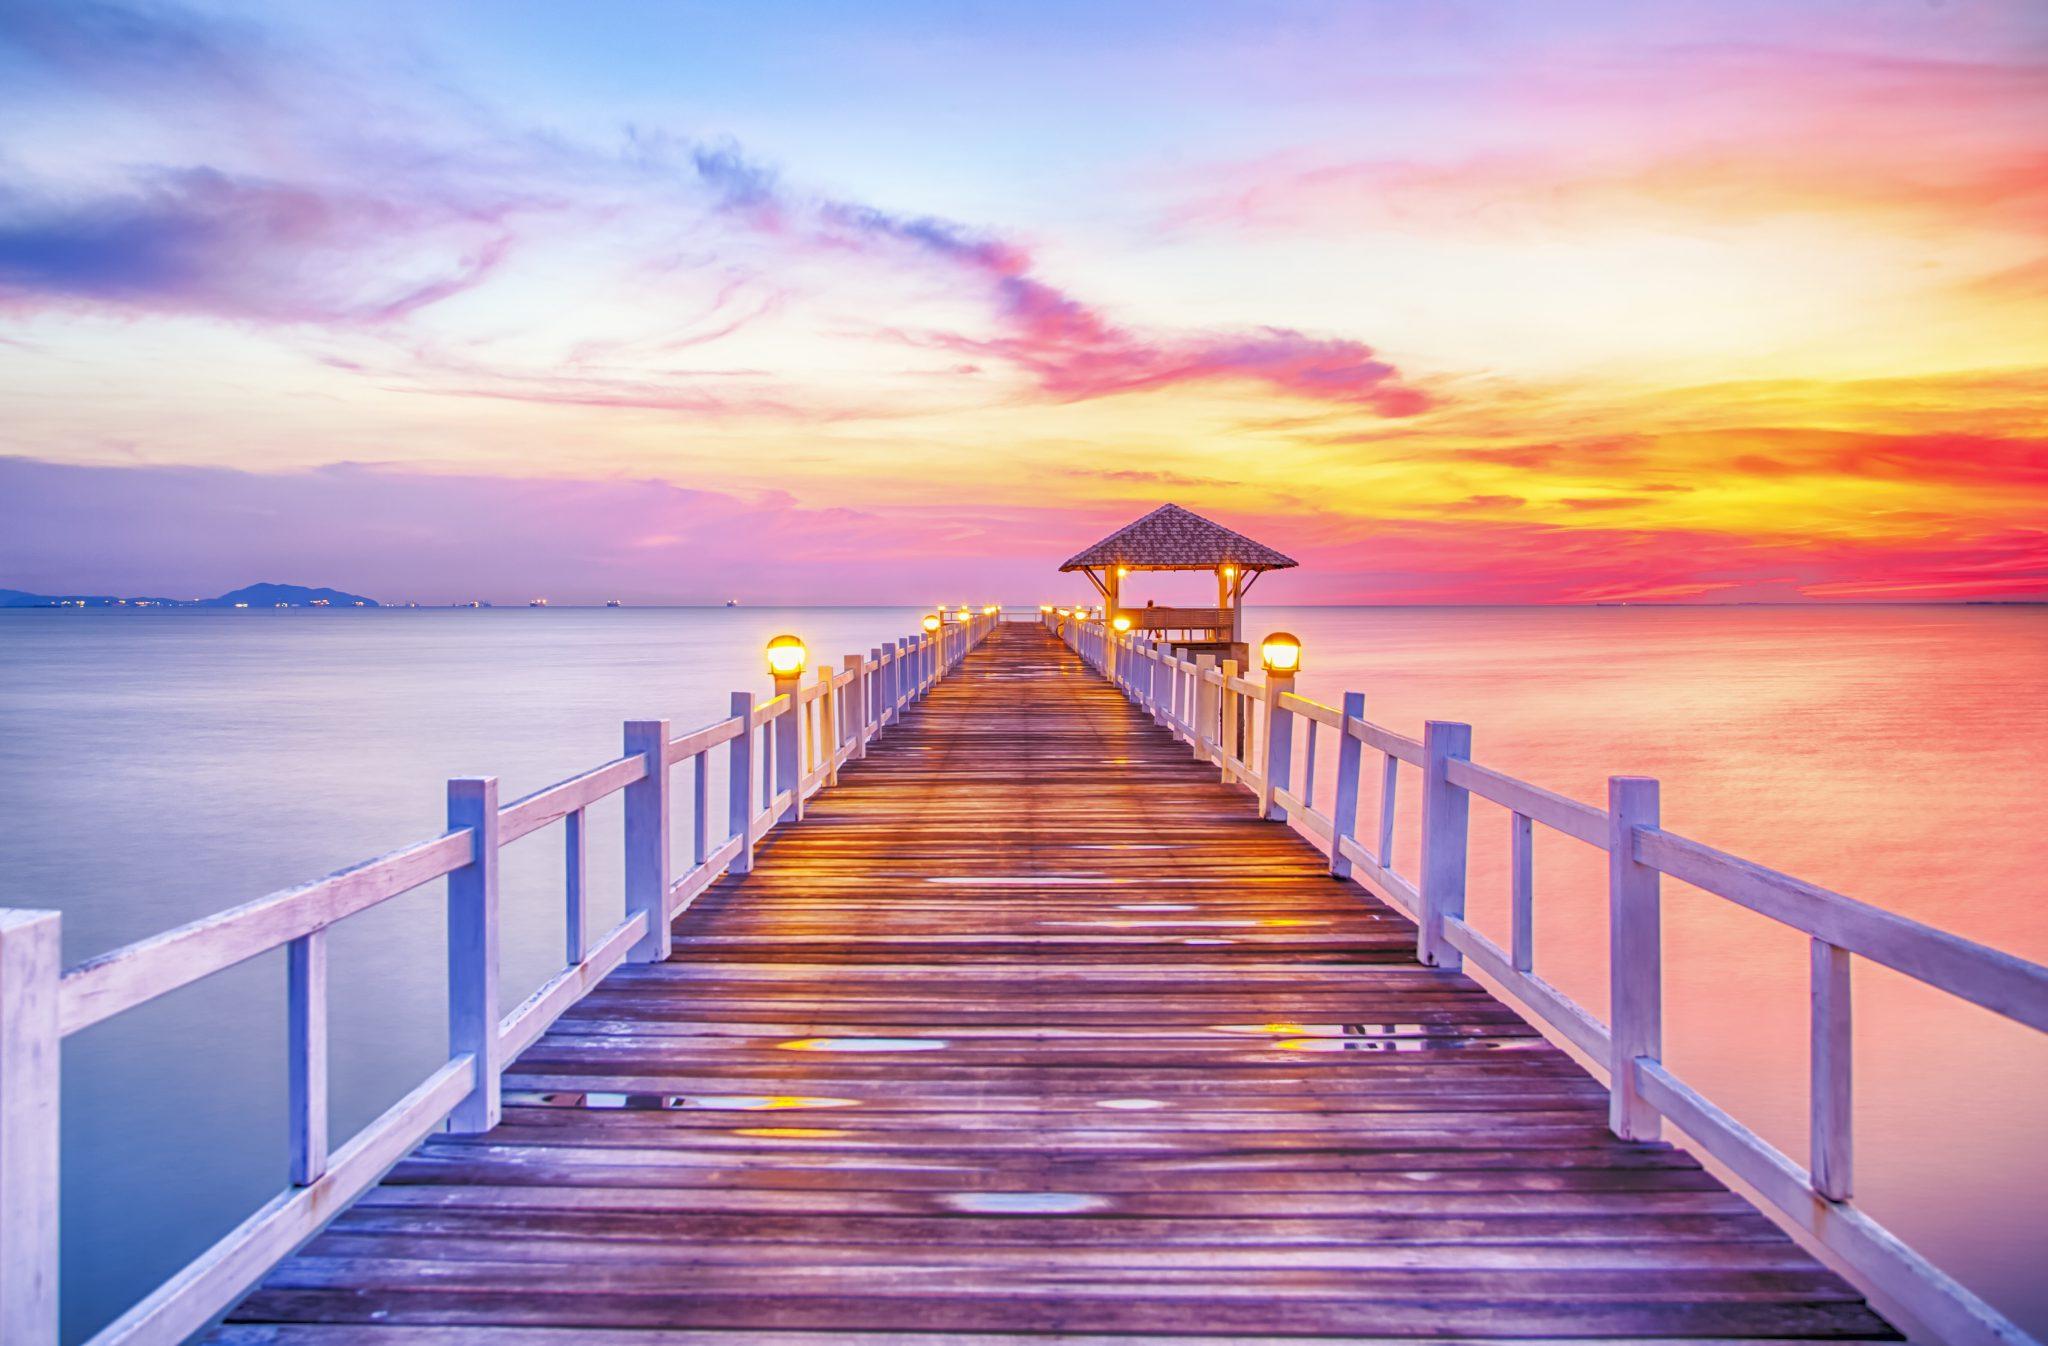 dock_uncompressed